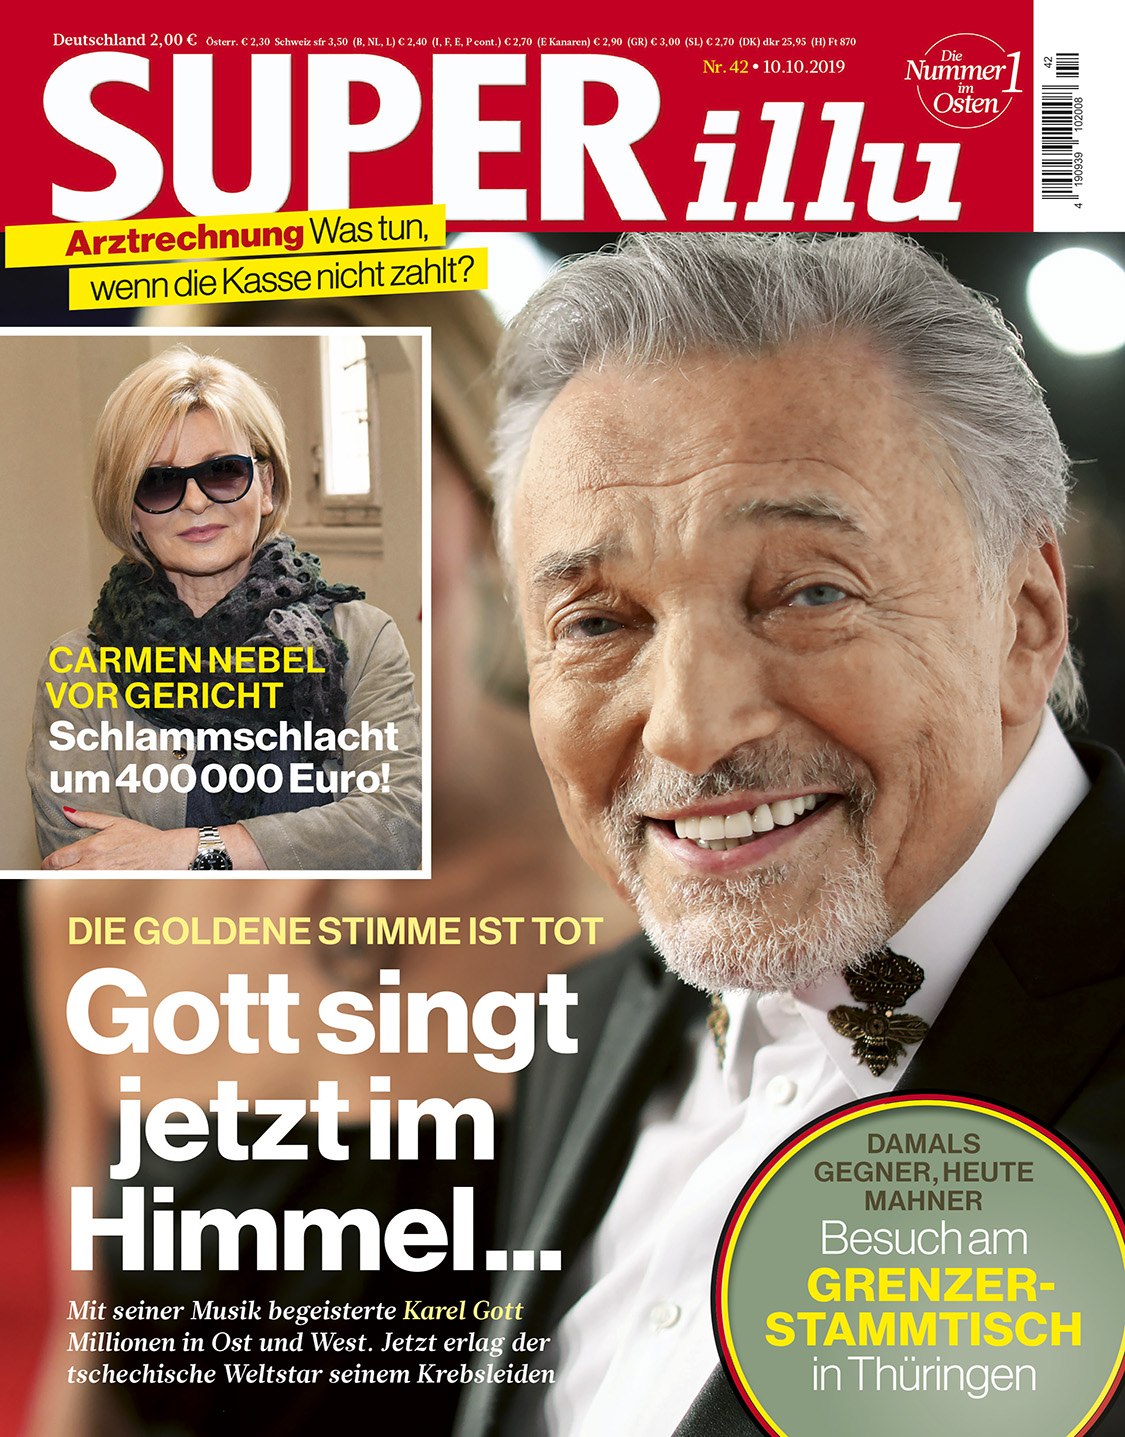 SUPERillu - aktuelle Ausgabe 42/2019